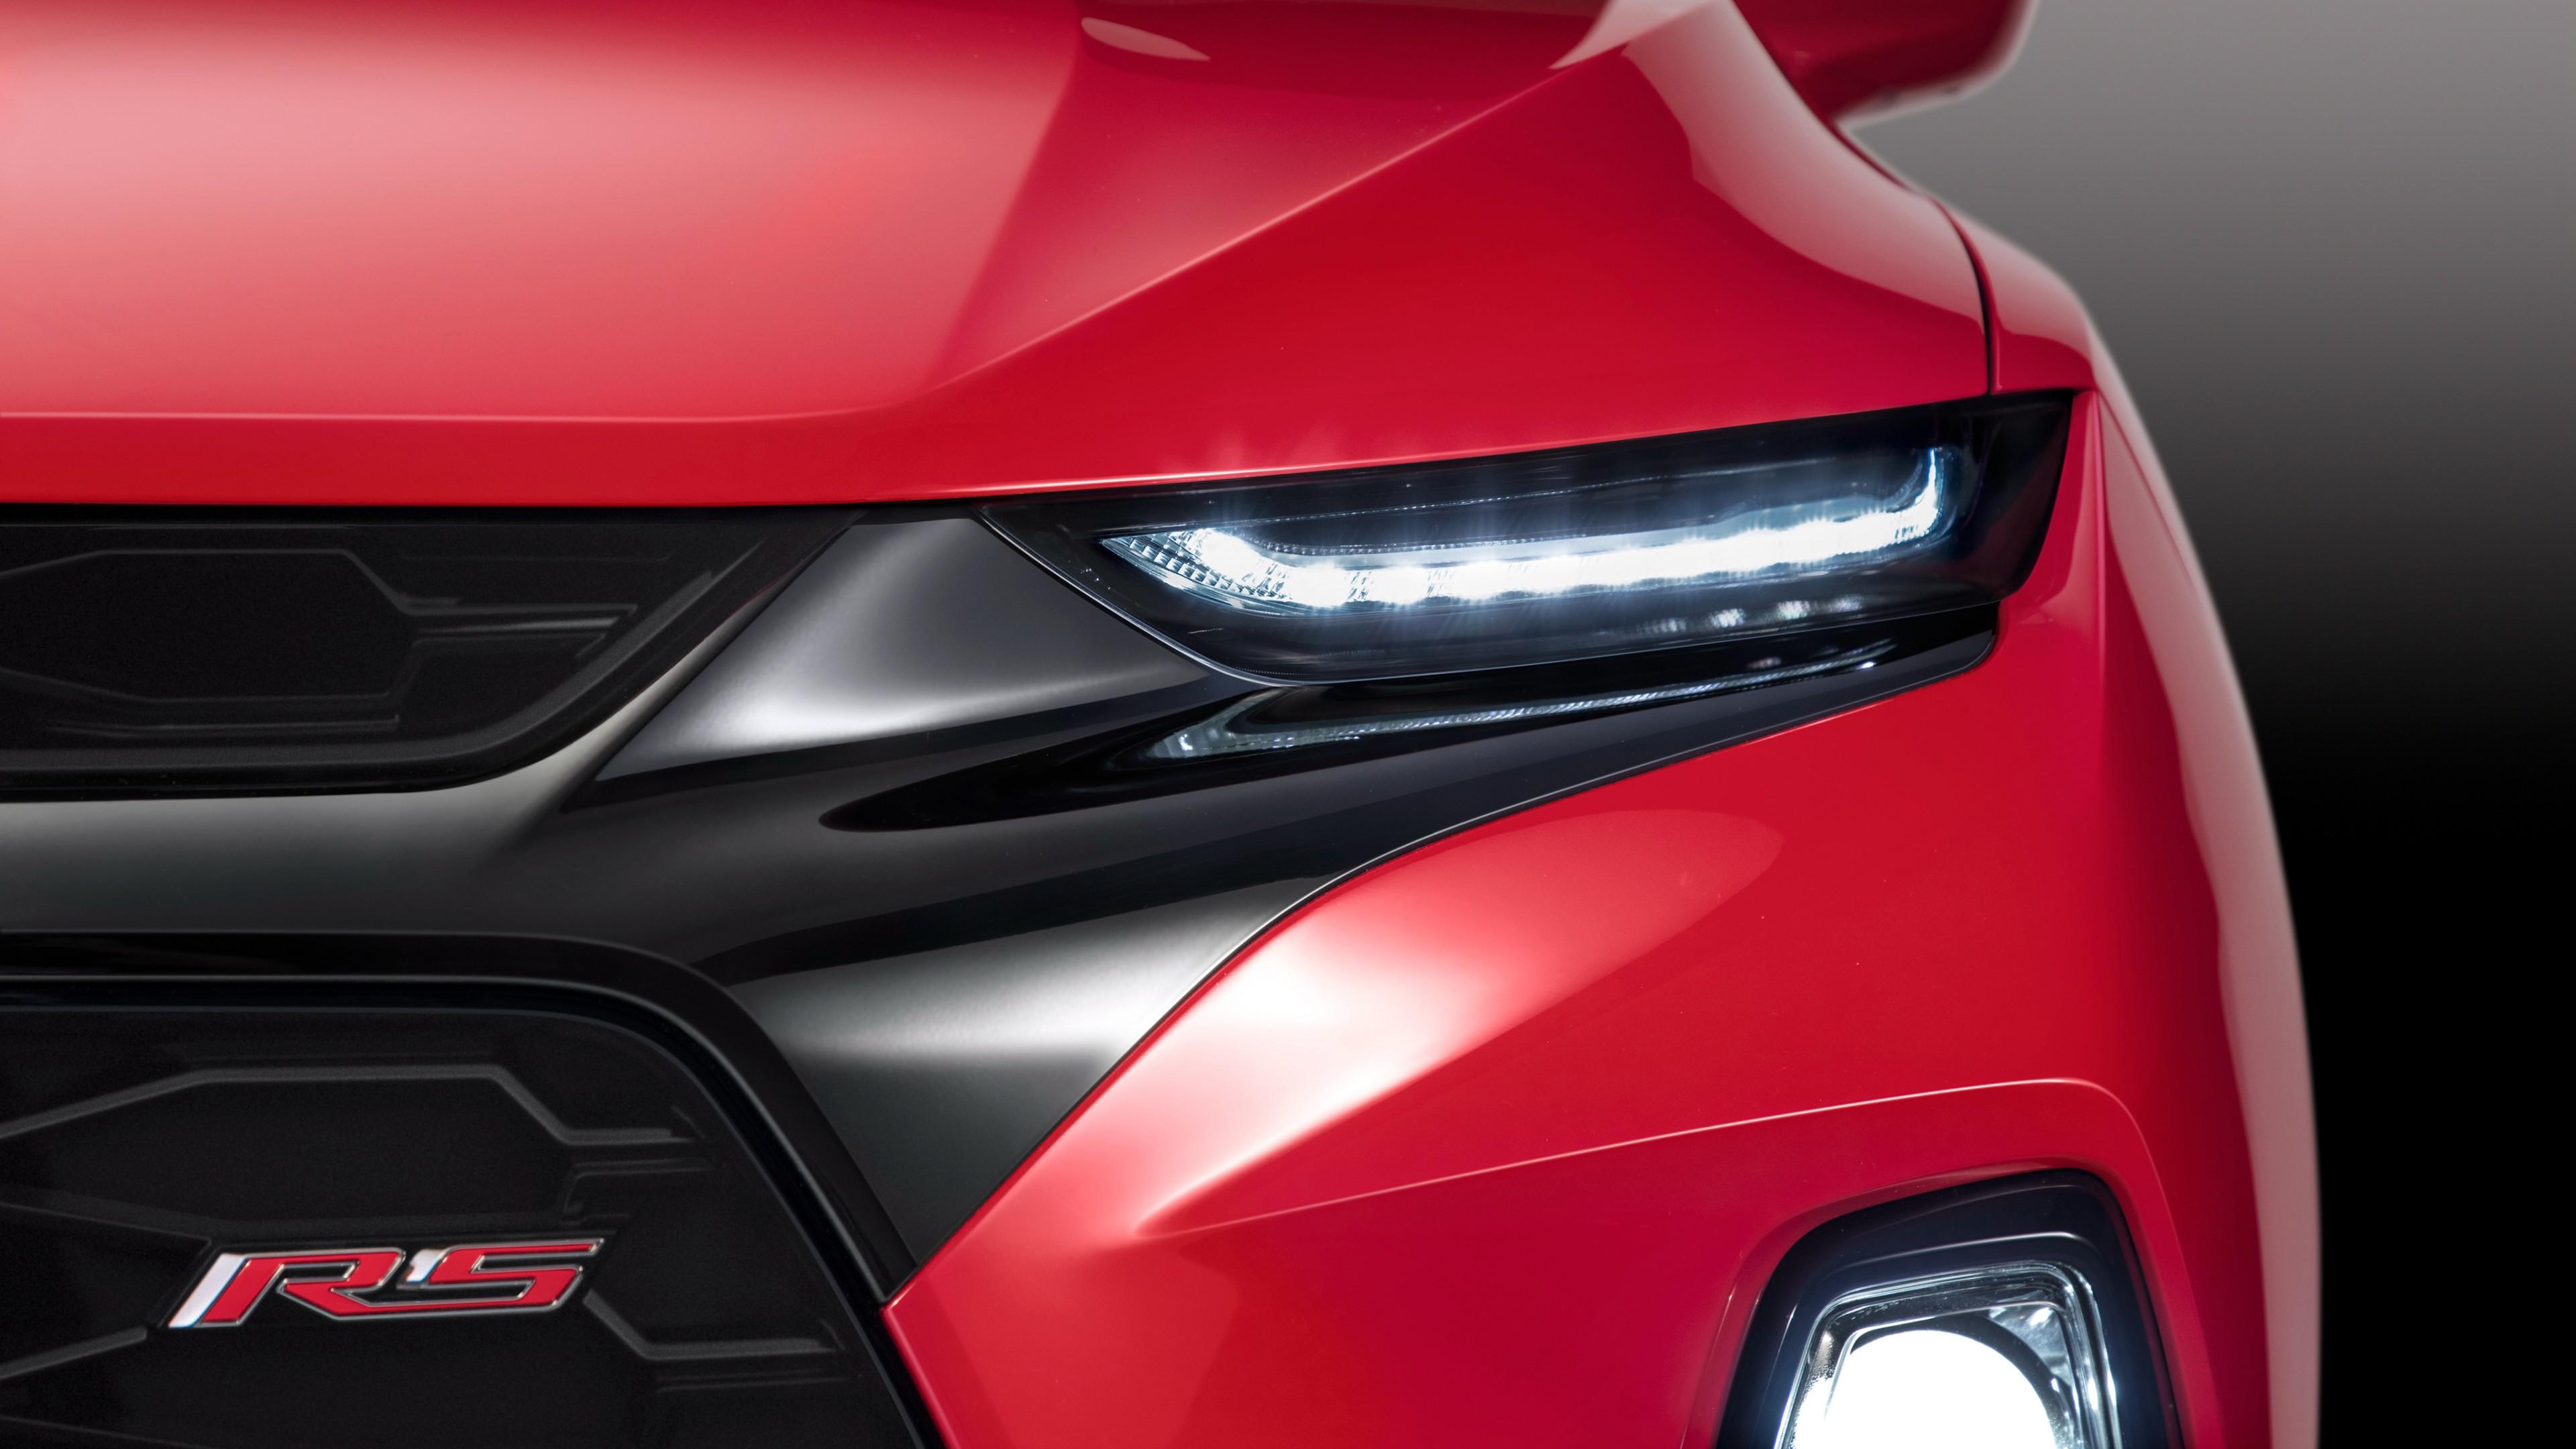 2019 Chevrolet Blazer Rs 4k Wallpaper Hd Car Wallpapers Id 10765